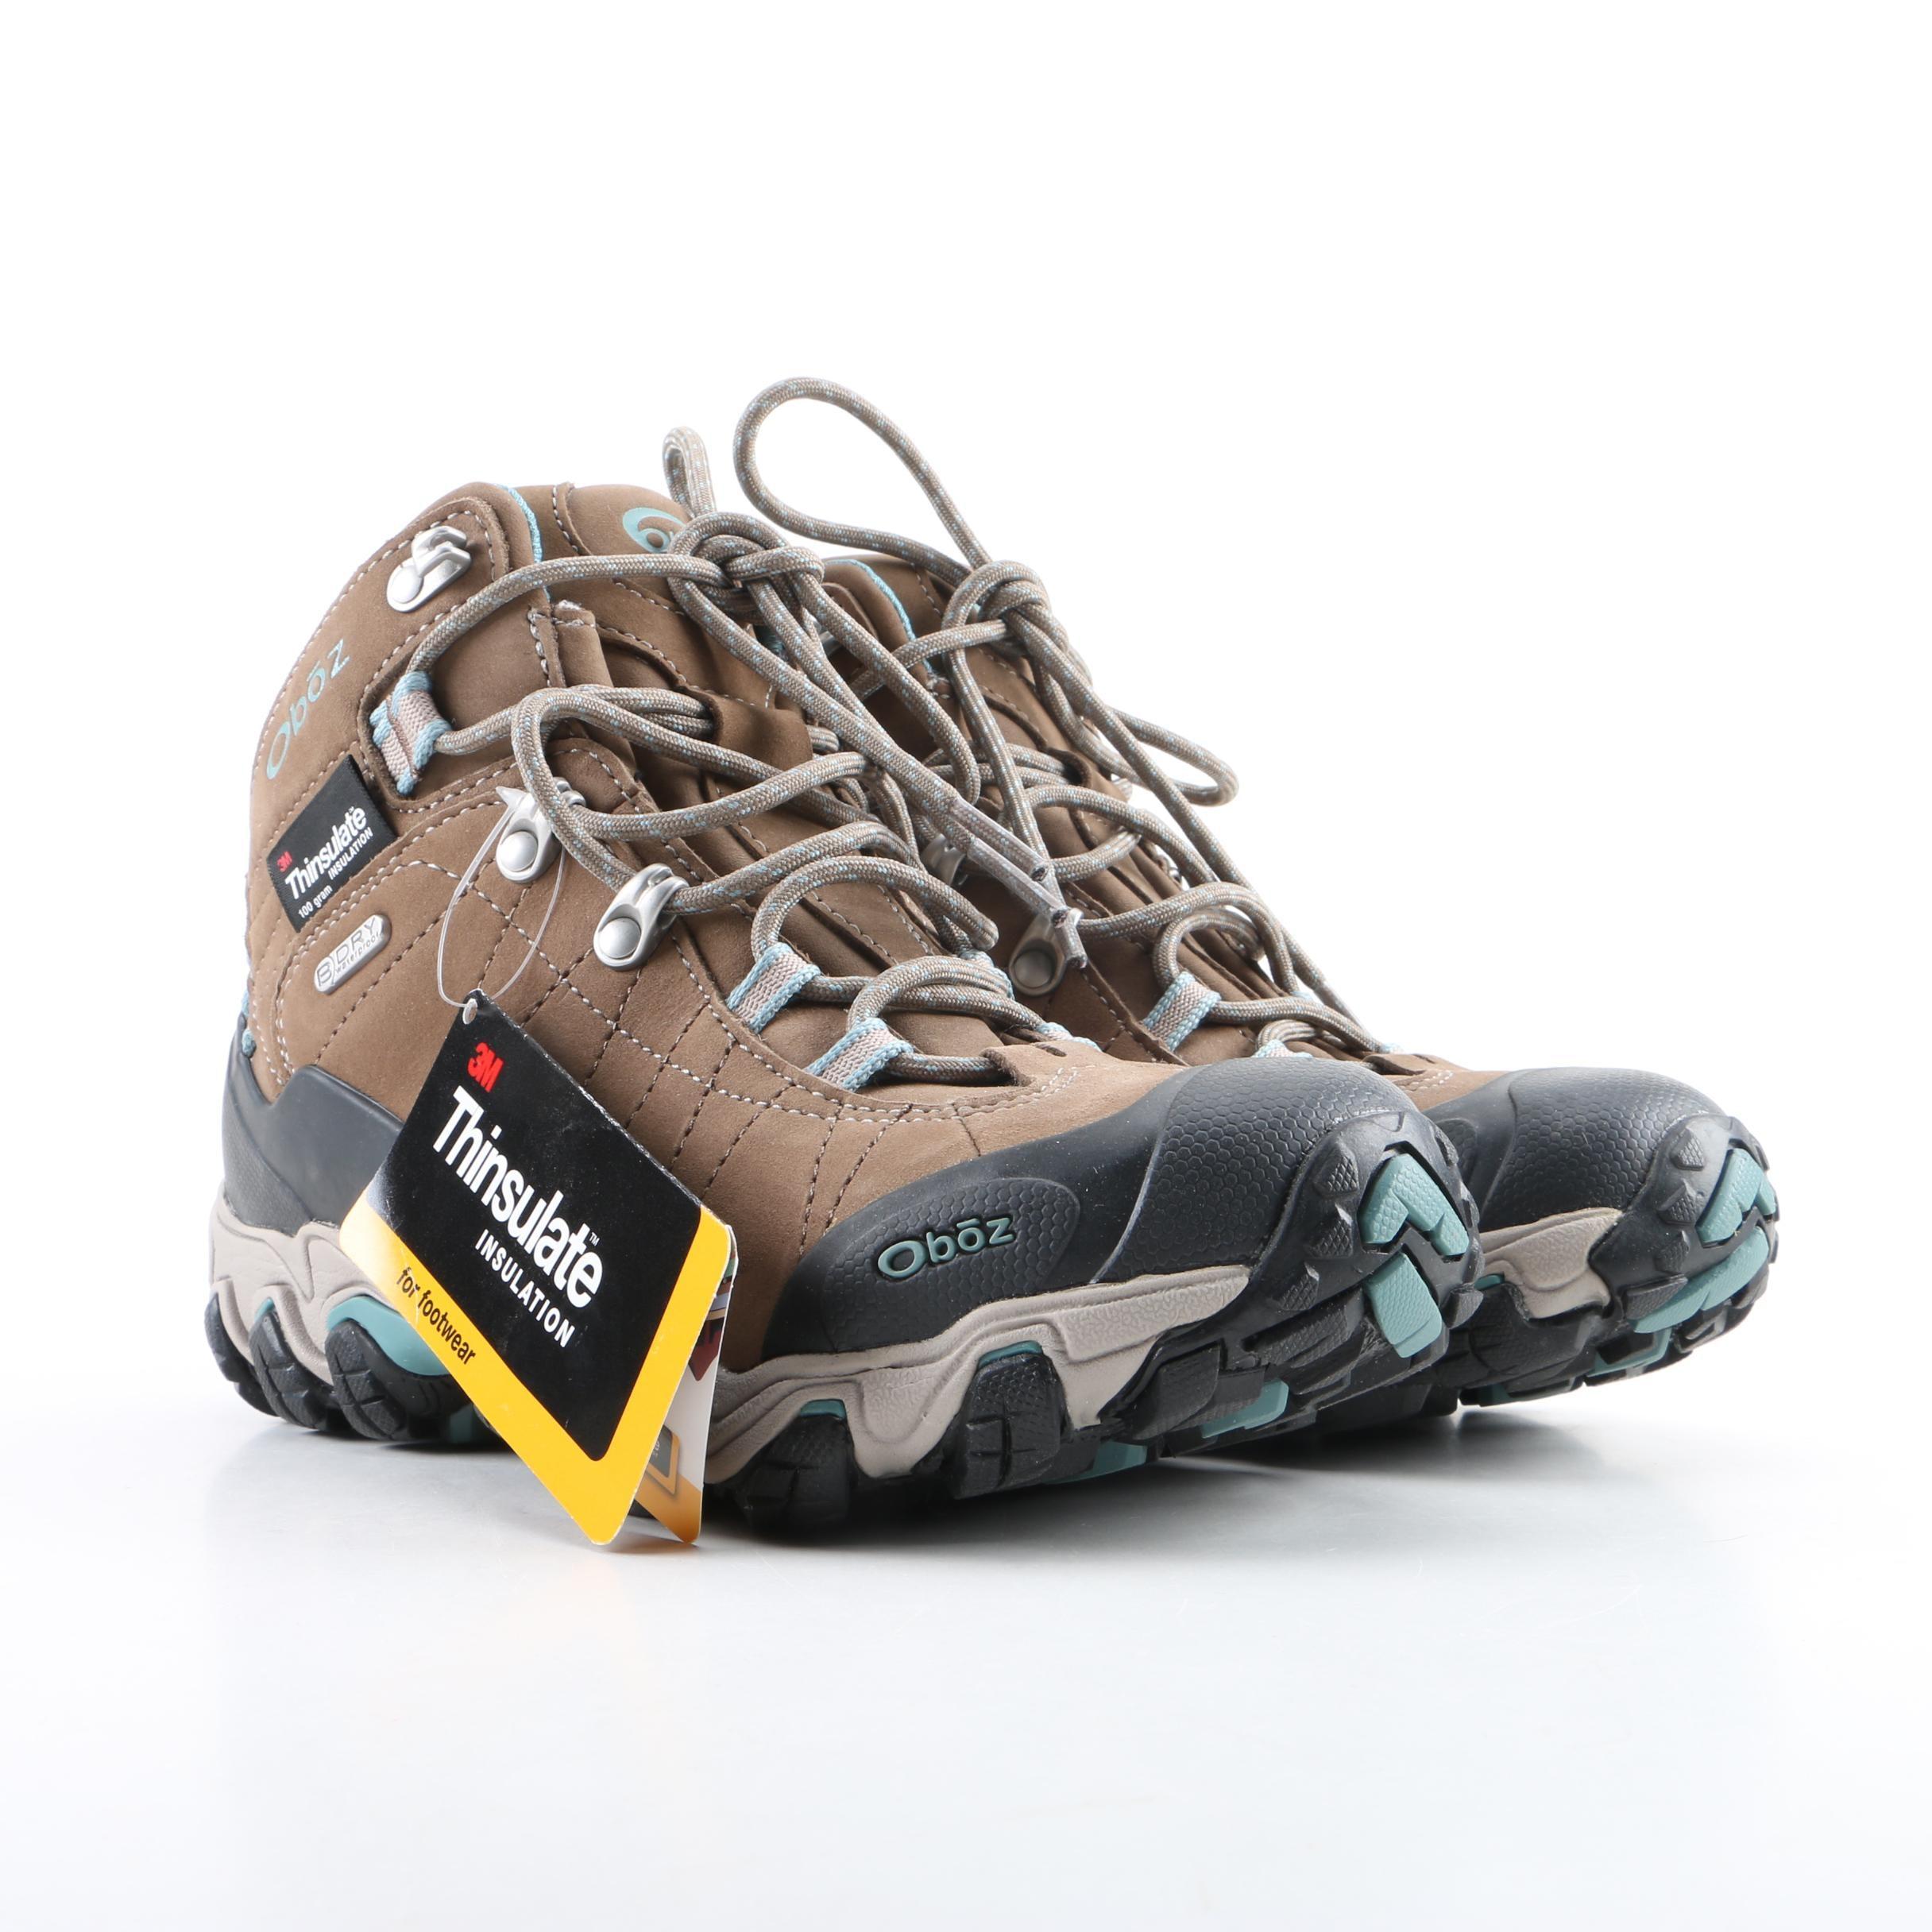 Women's Obōz Thinsulate Waterproof Hiking Boots